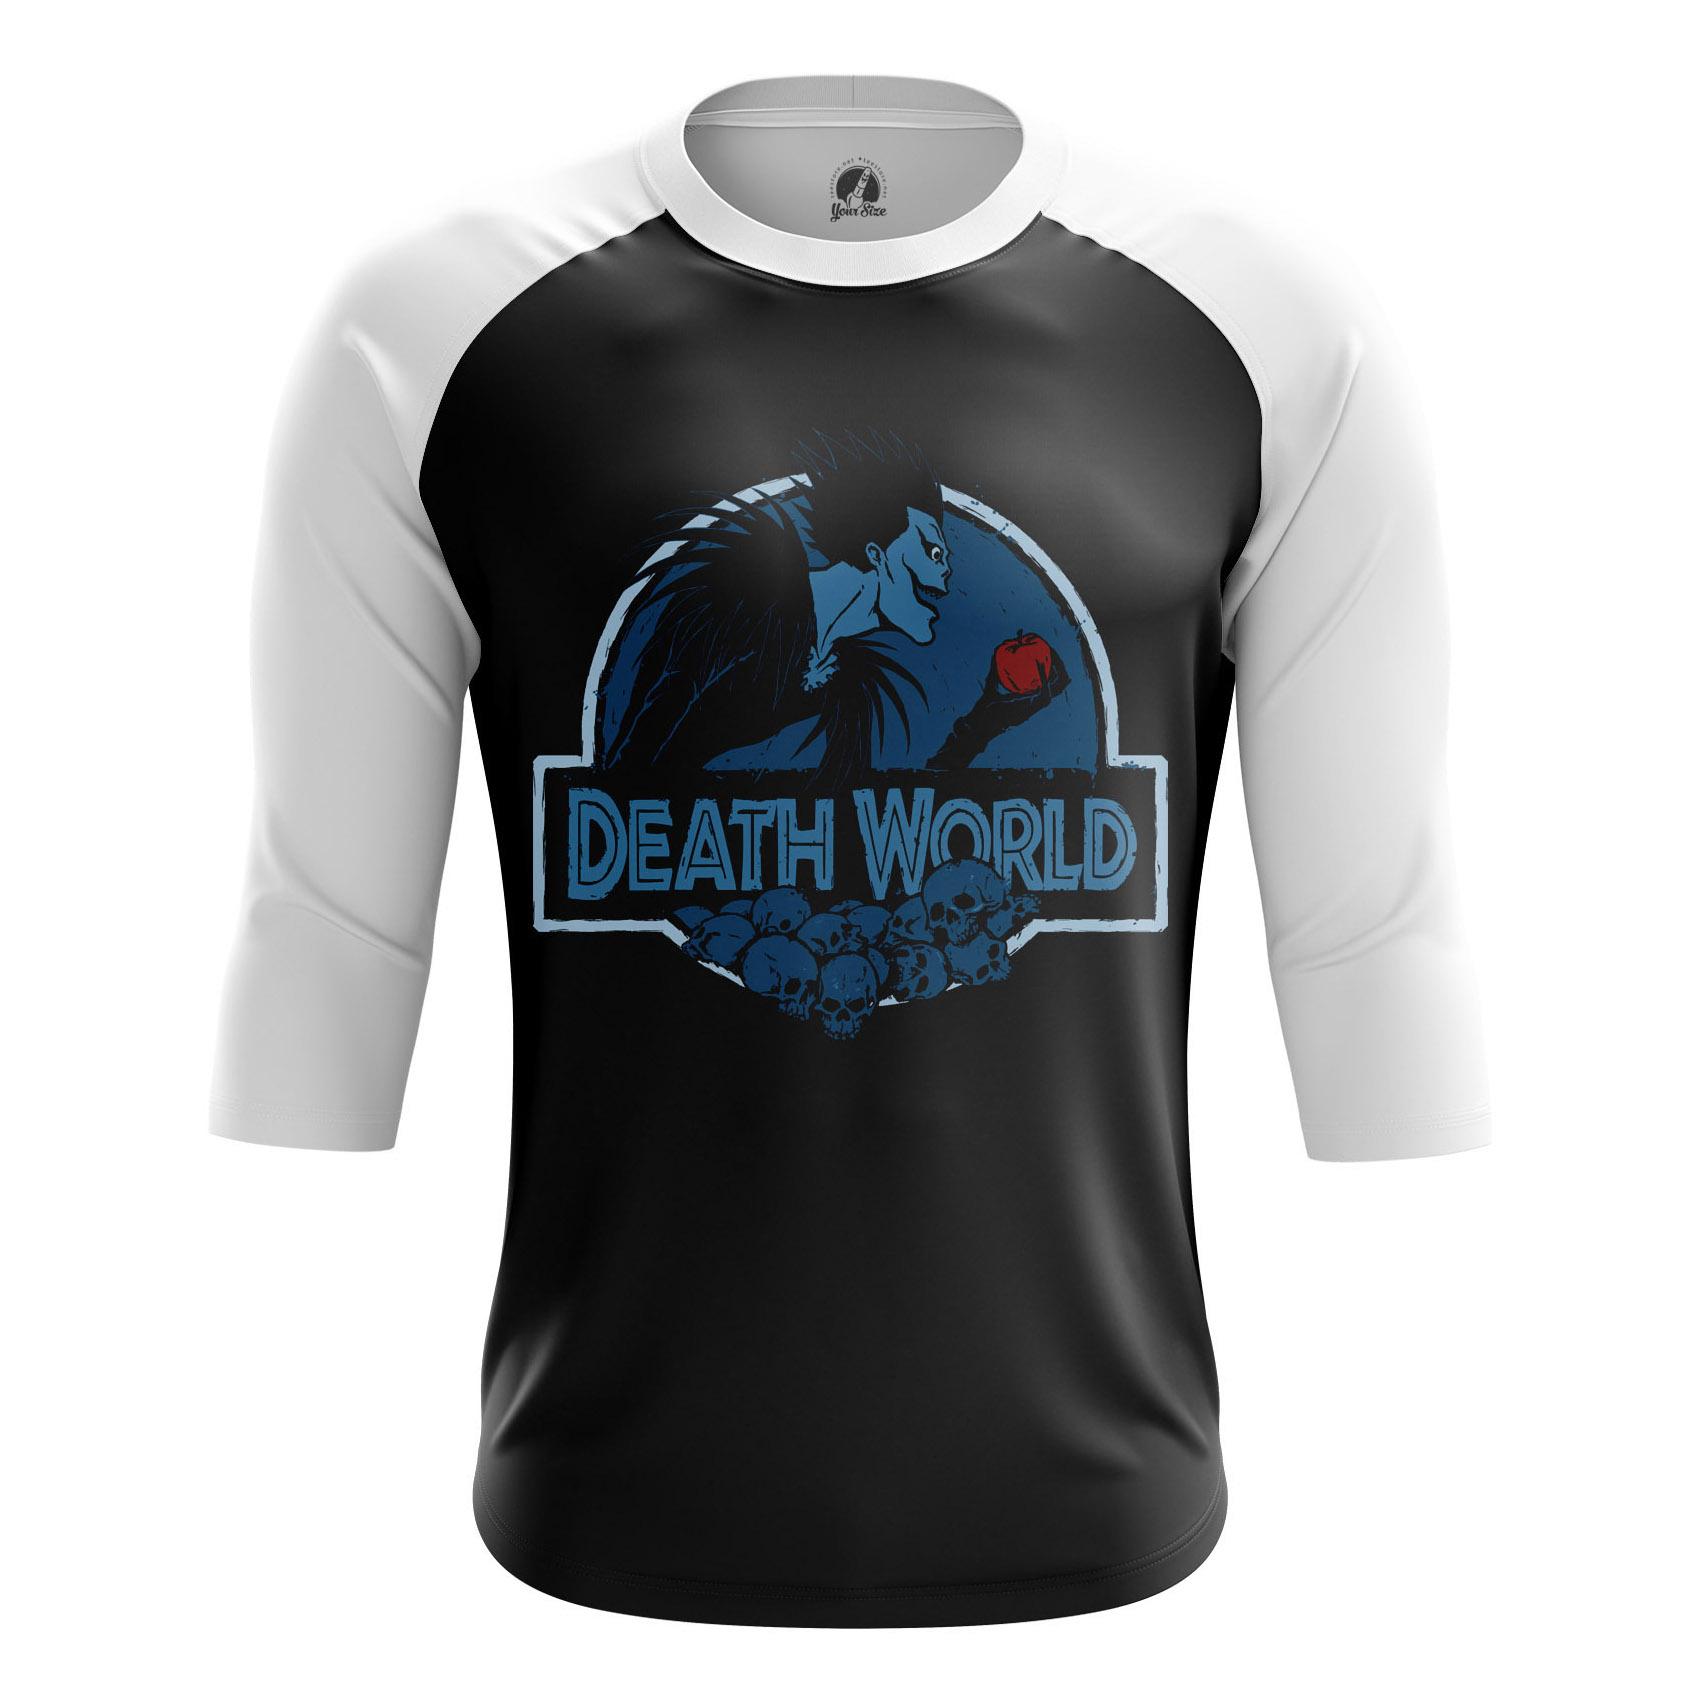 m rag deathworld 1482275296 193